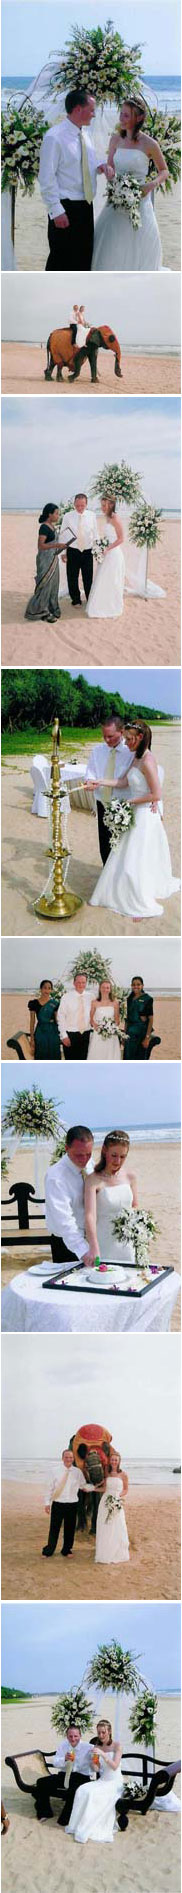 Real Wedding in Sri Lanka Sian and Michael